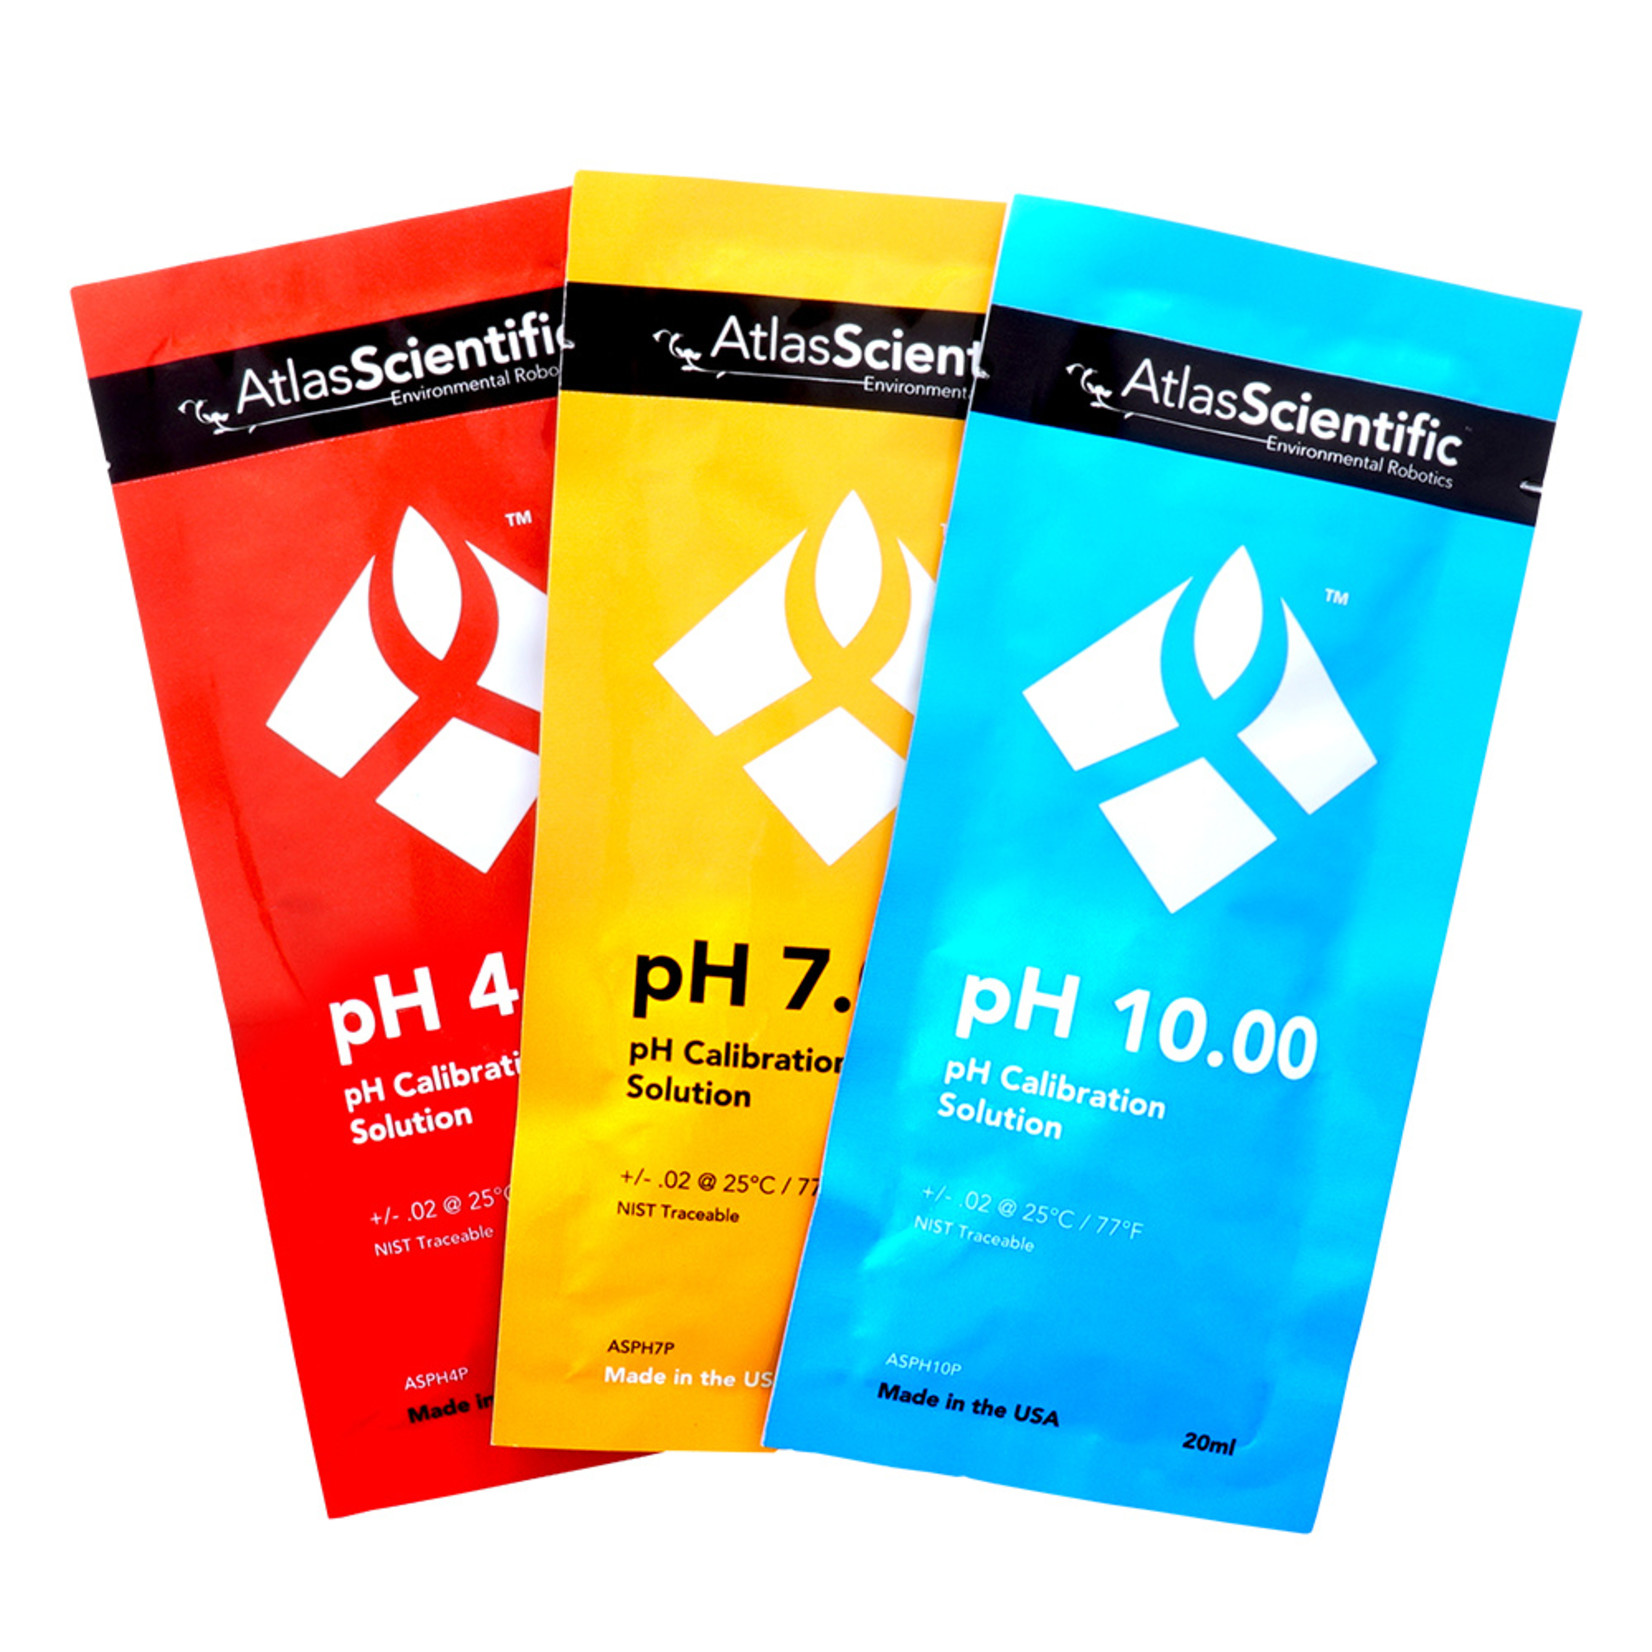 Atlas Scientific pH 7.00 Calibration Solution Pouche